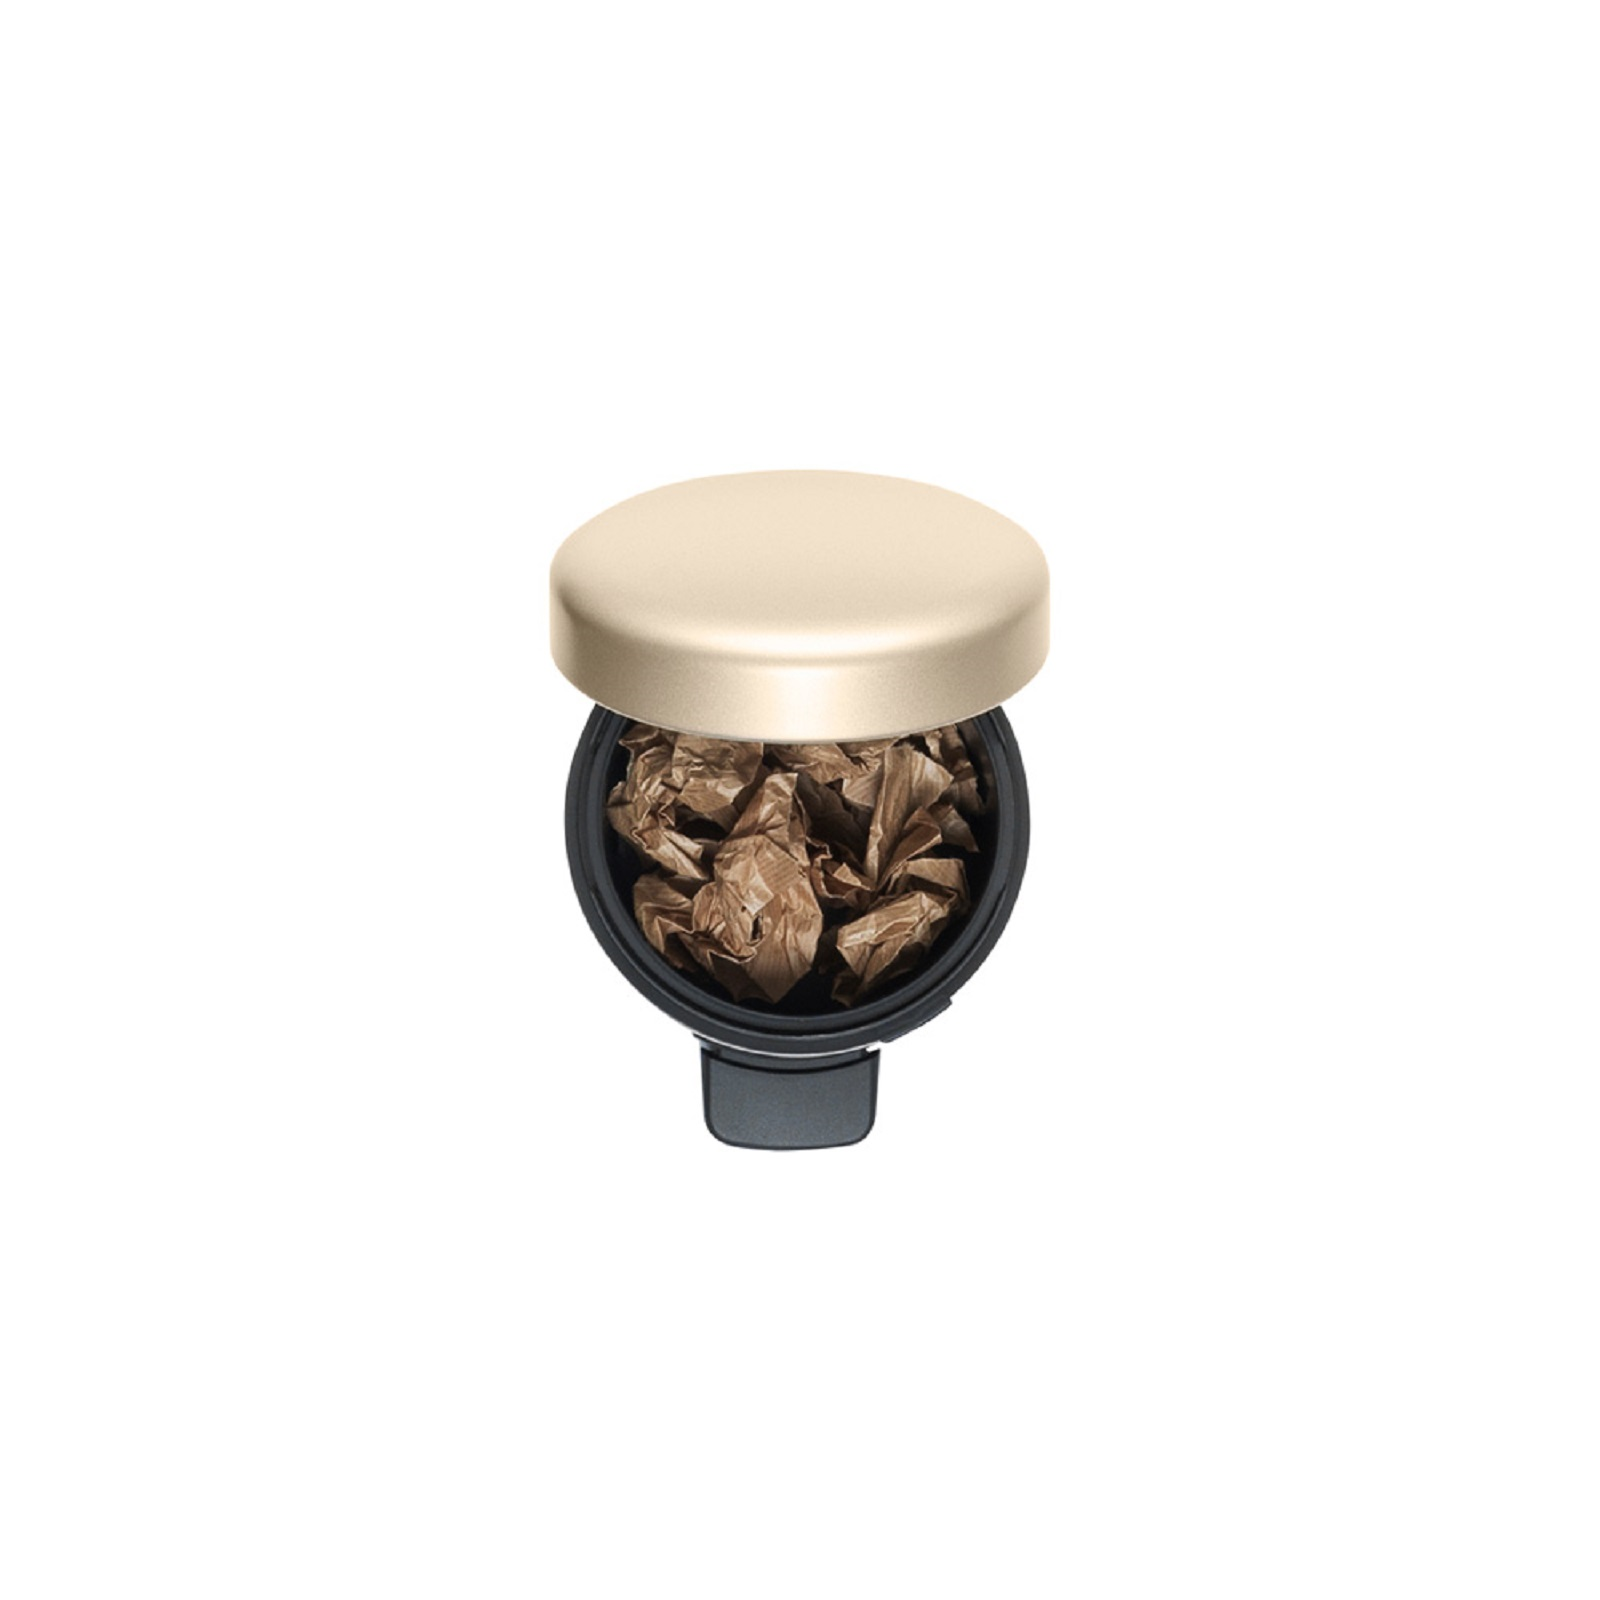 Бак для мусора Pedal Bin NewIcon Brabantia, объем 3 л, шампань бежевый Brabantia 304408 фото 1